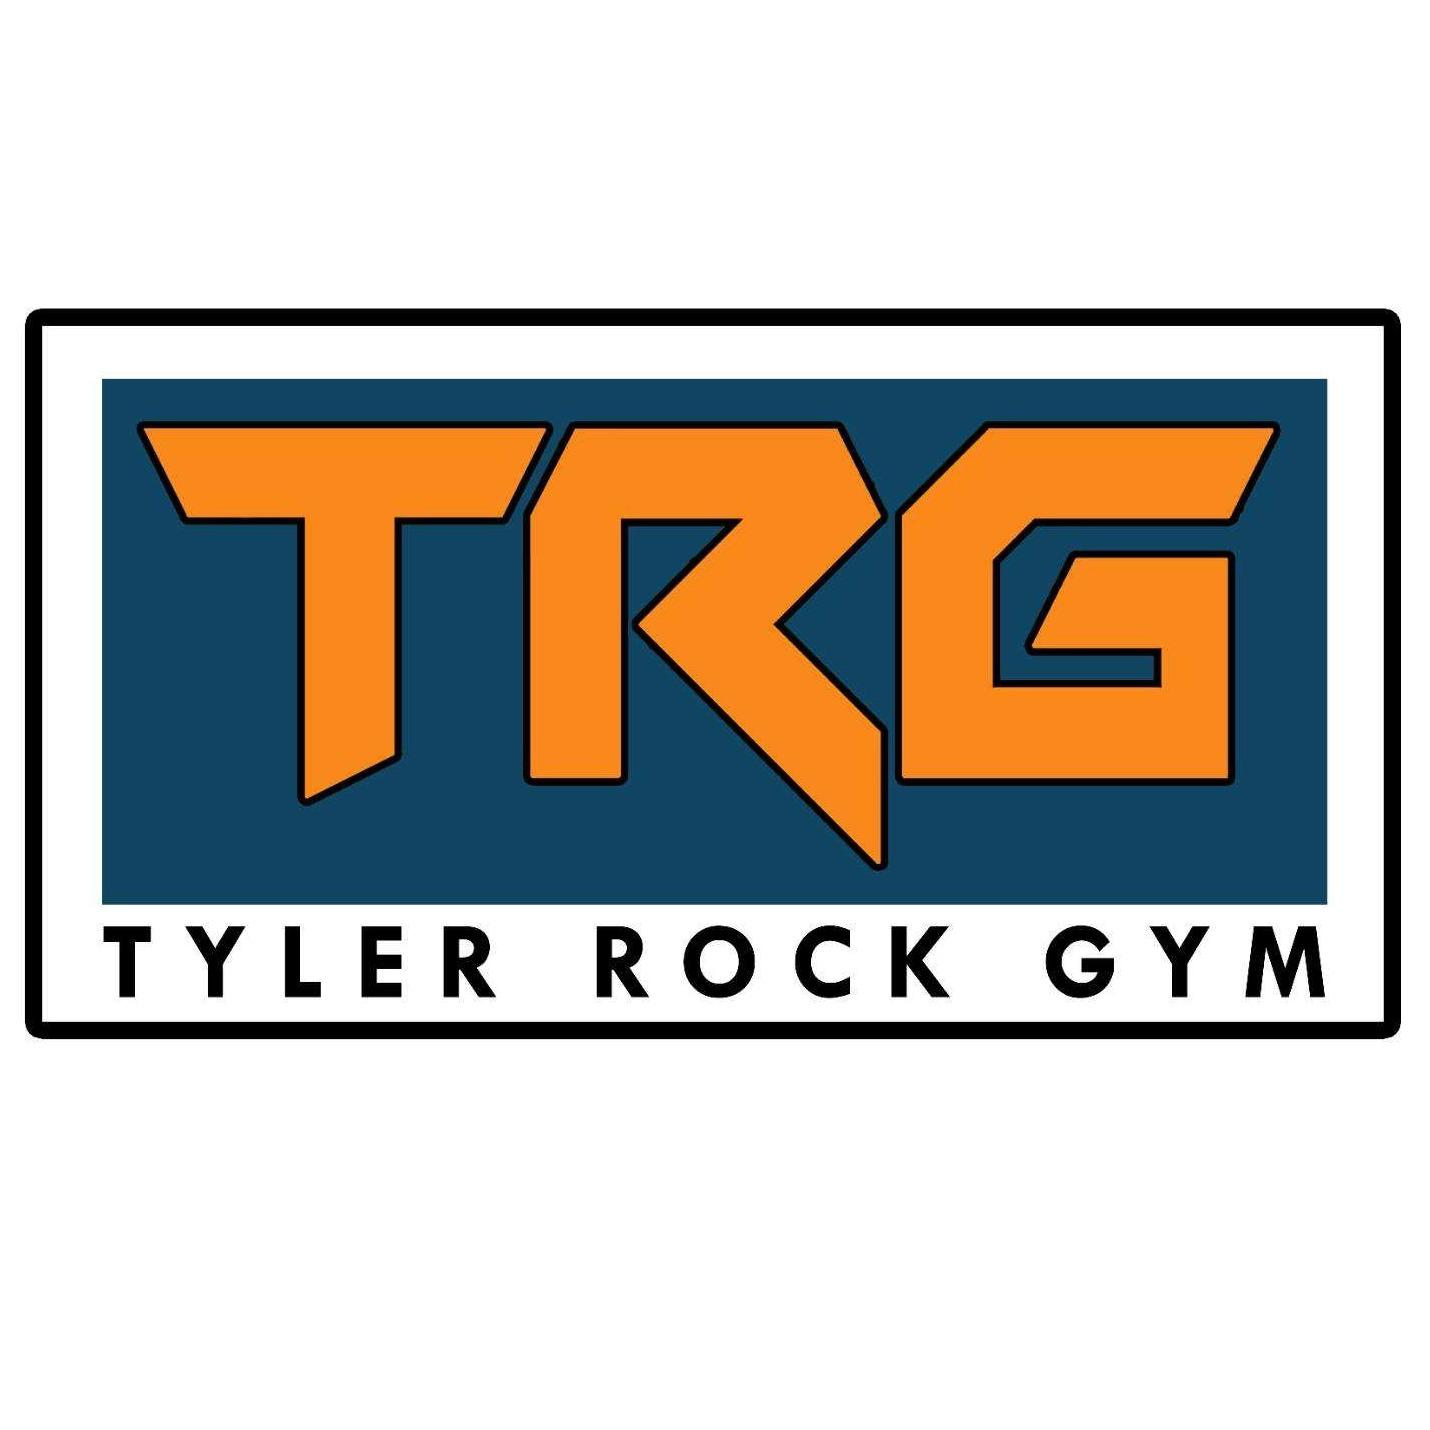 Tyler Rock Gym